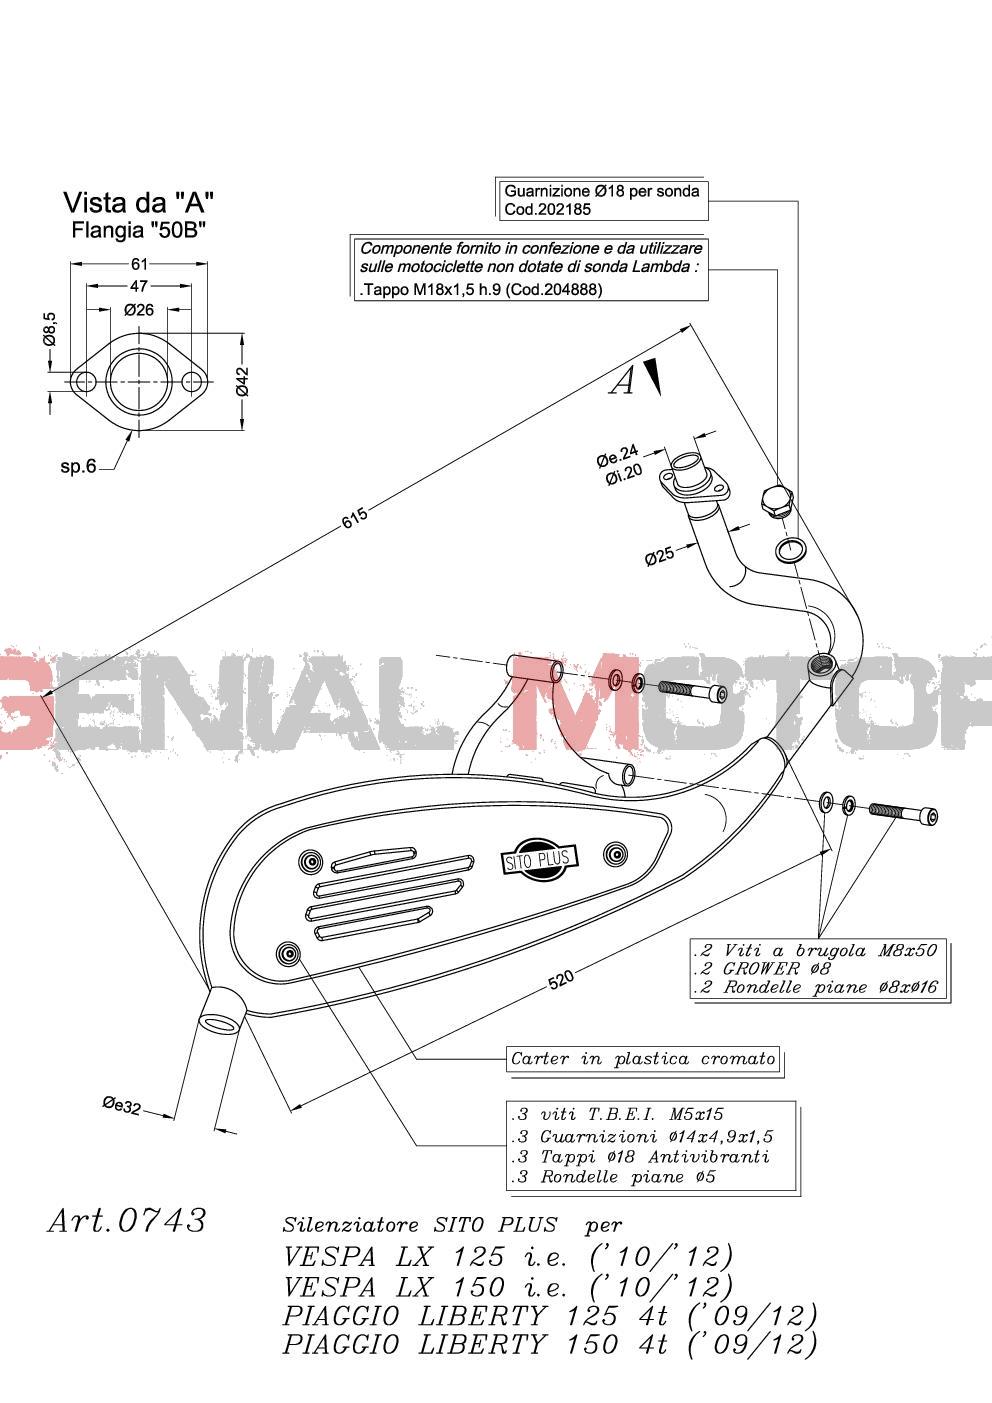 0743 Pot D'Echappement Complete Leovince Vespa Vespa Lx 125 I E 4 Stroke 2009 > 2012